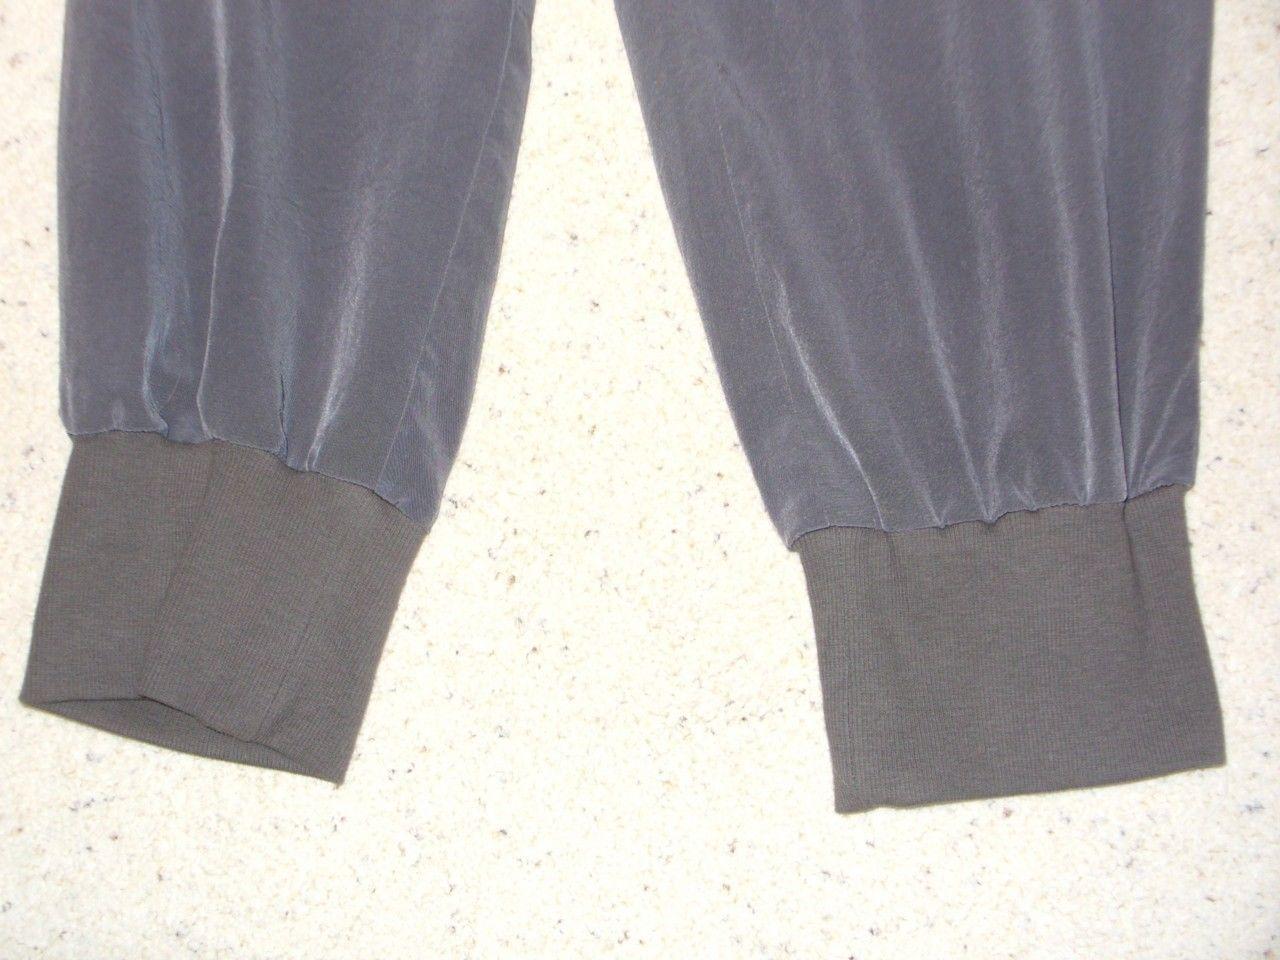 ELIZABETH & JAMES Pants Cropped Banding Drawstring Waist 6 Silky